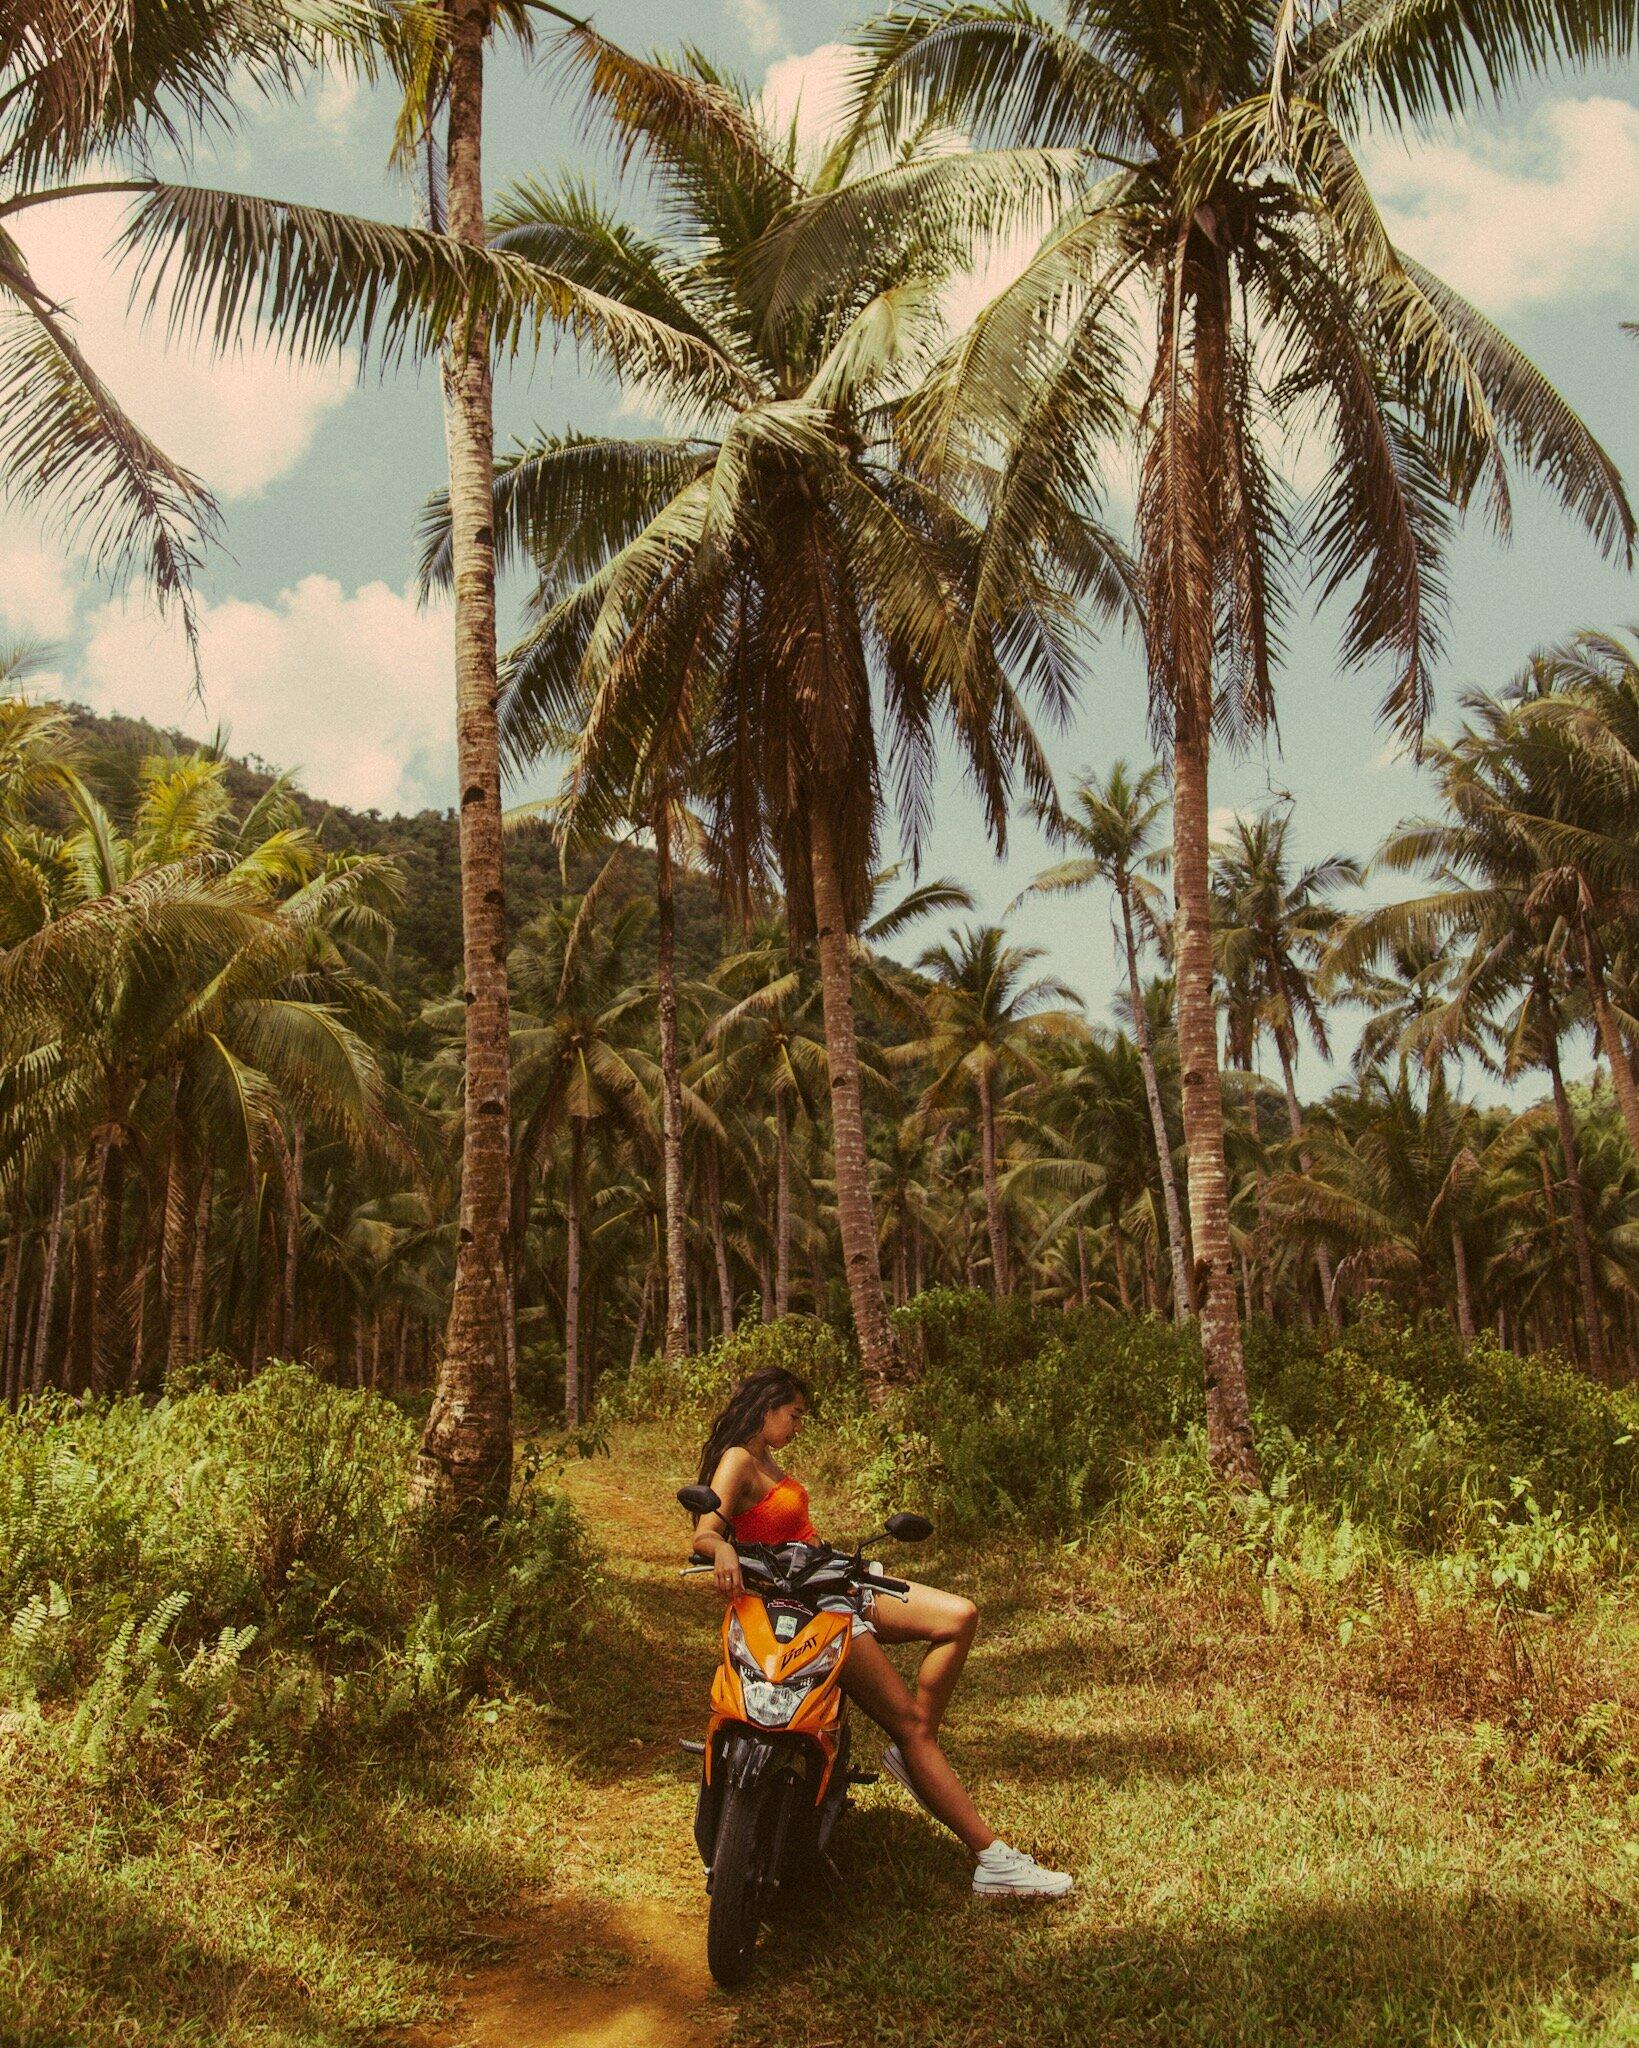 Siargao-palm-trees-motorbike-beplay3体育官方下载illumelation.JPG